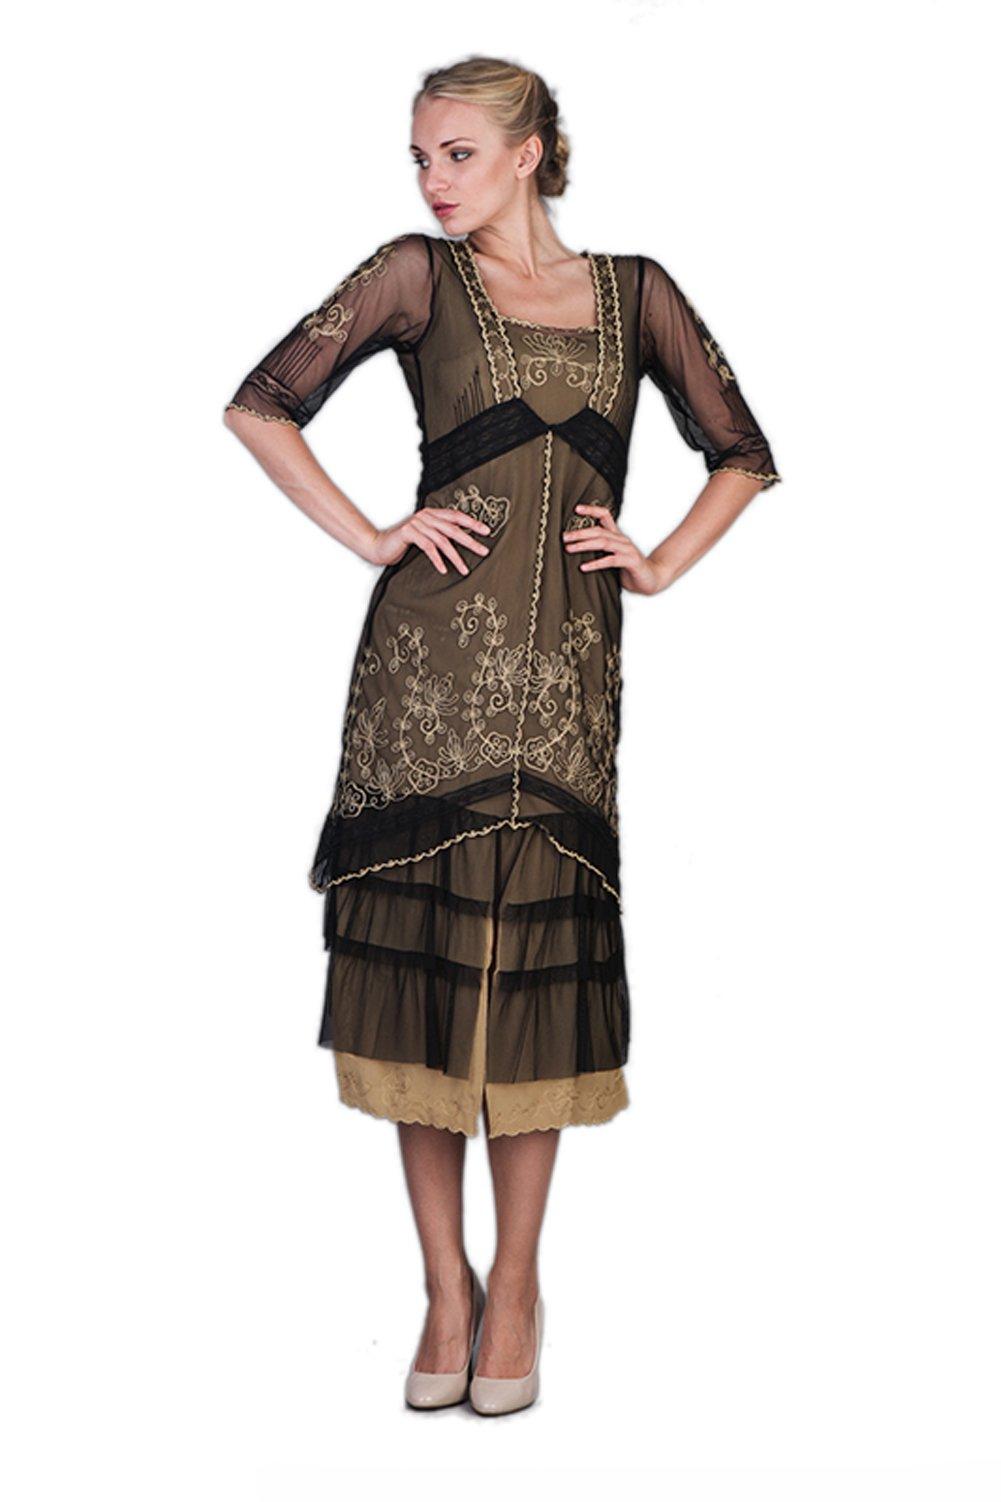 Nataya 2101 Women's Titanic Vintage Style Dress in Black/Gold (X-Large)